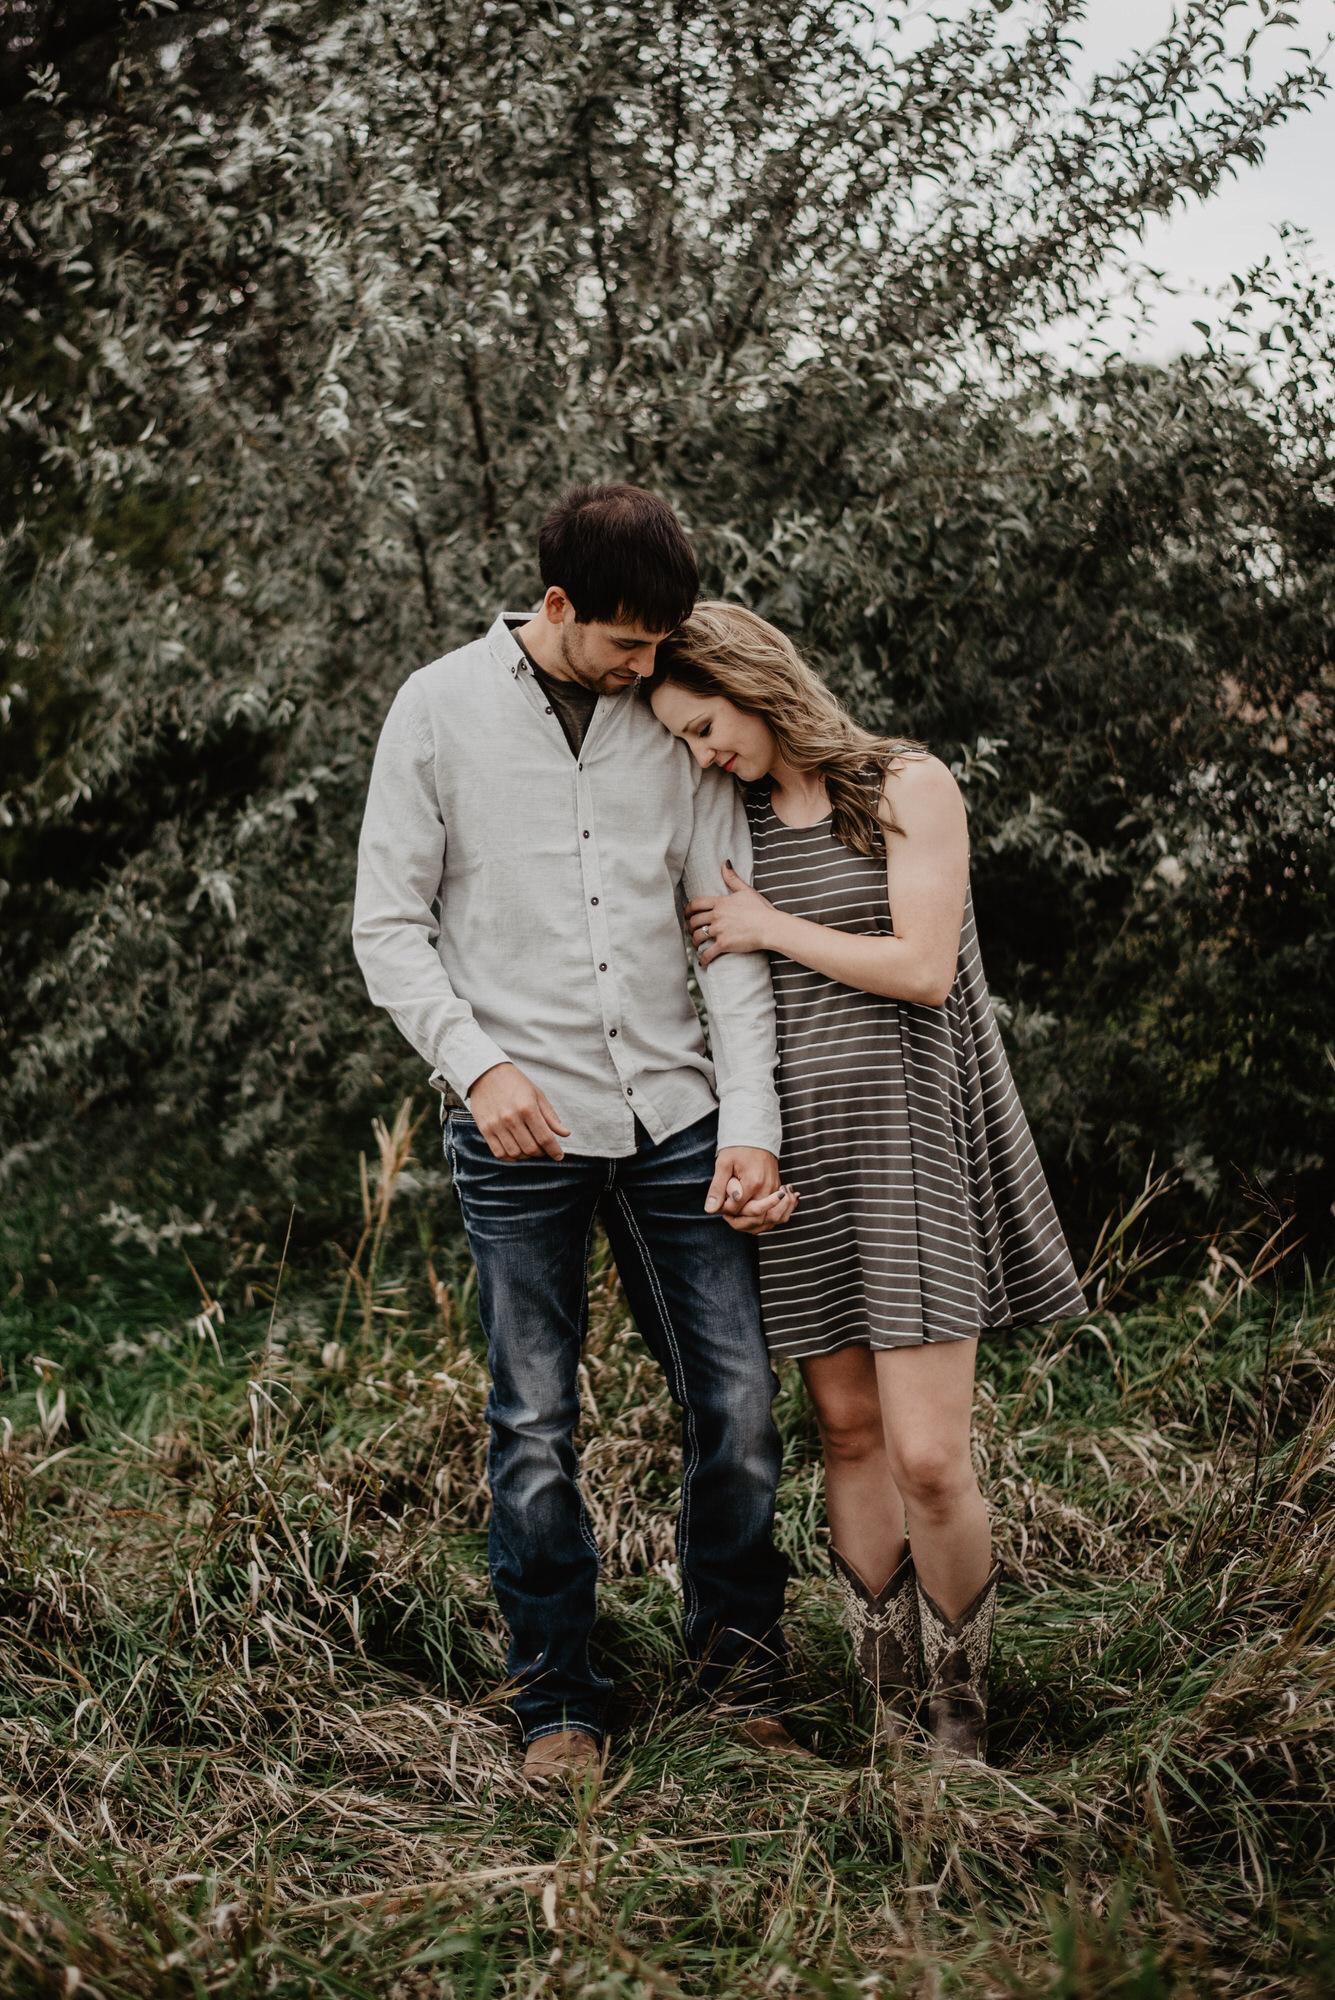 Kaylie-Sirek-Photography-wedding-engagement-photographer-Grand-Island-Kearney-Hastings-Lincoln-Nebraska-central-midwest-moments-trump-posing-natural-light-engaged-10.jpg